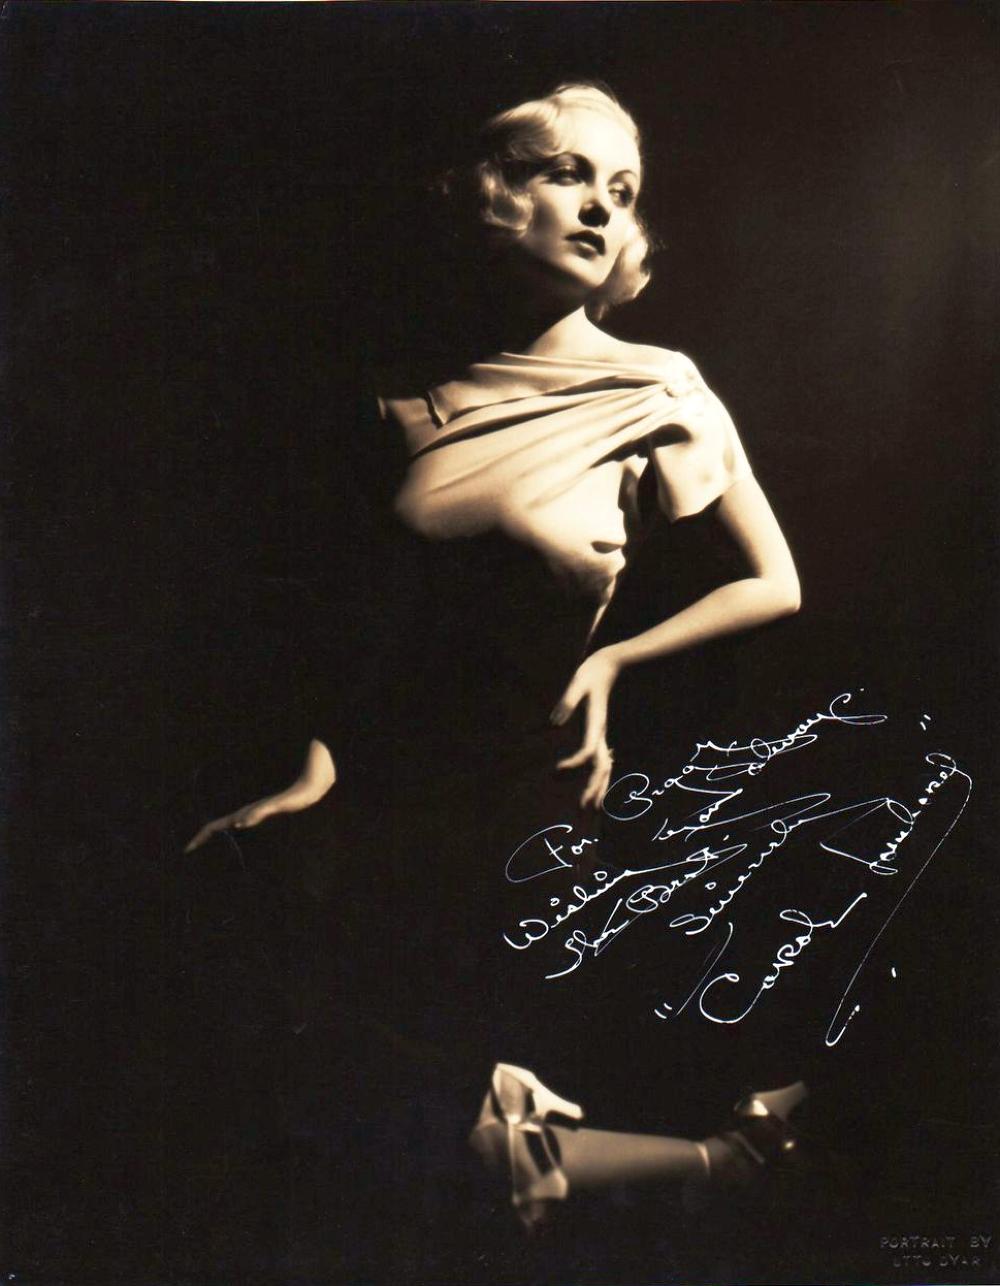 carole lombard autograph 81a front